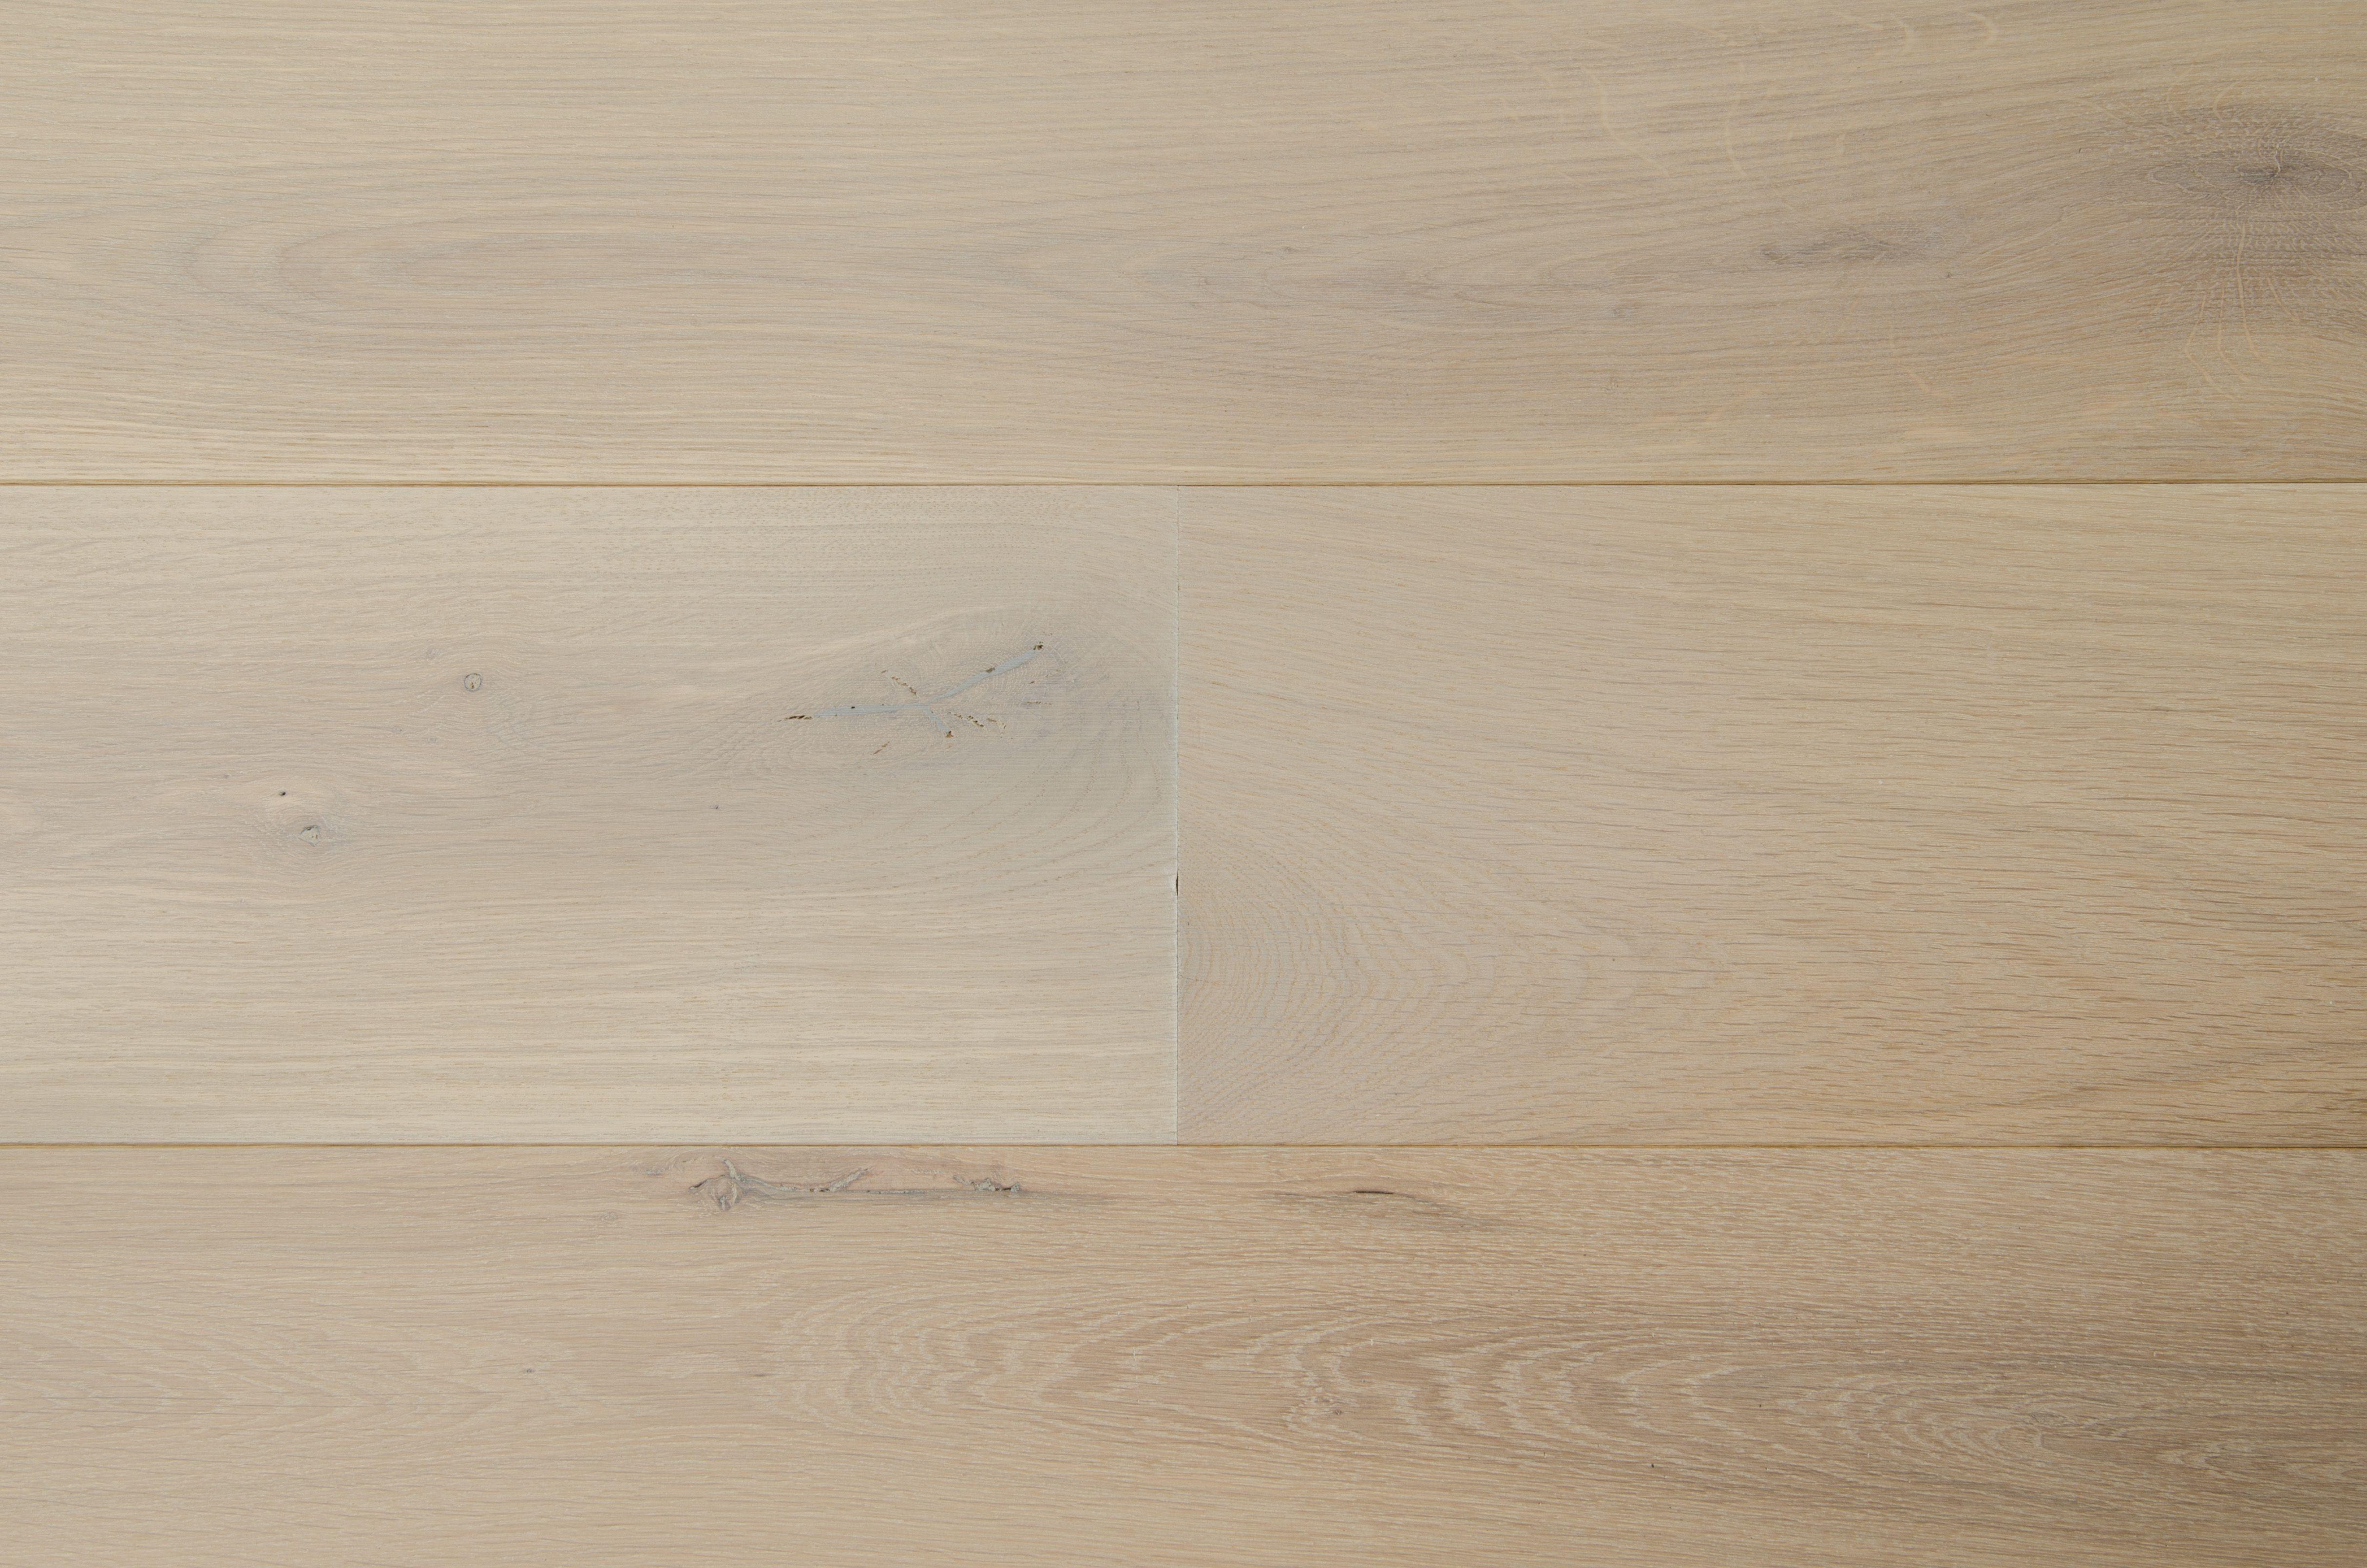 5 8 vs 3 4 hardwood flooring of european oak naples species european oak color naples within european oak naples species european oak color